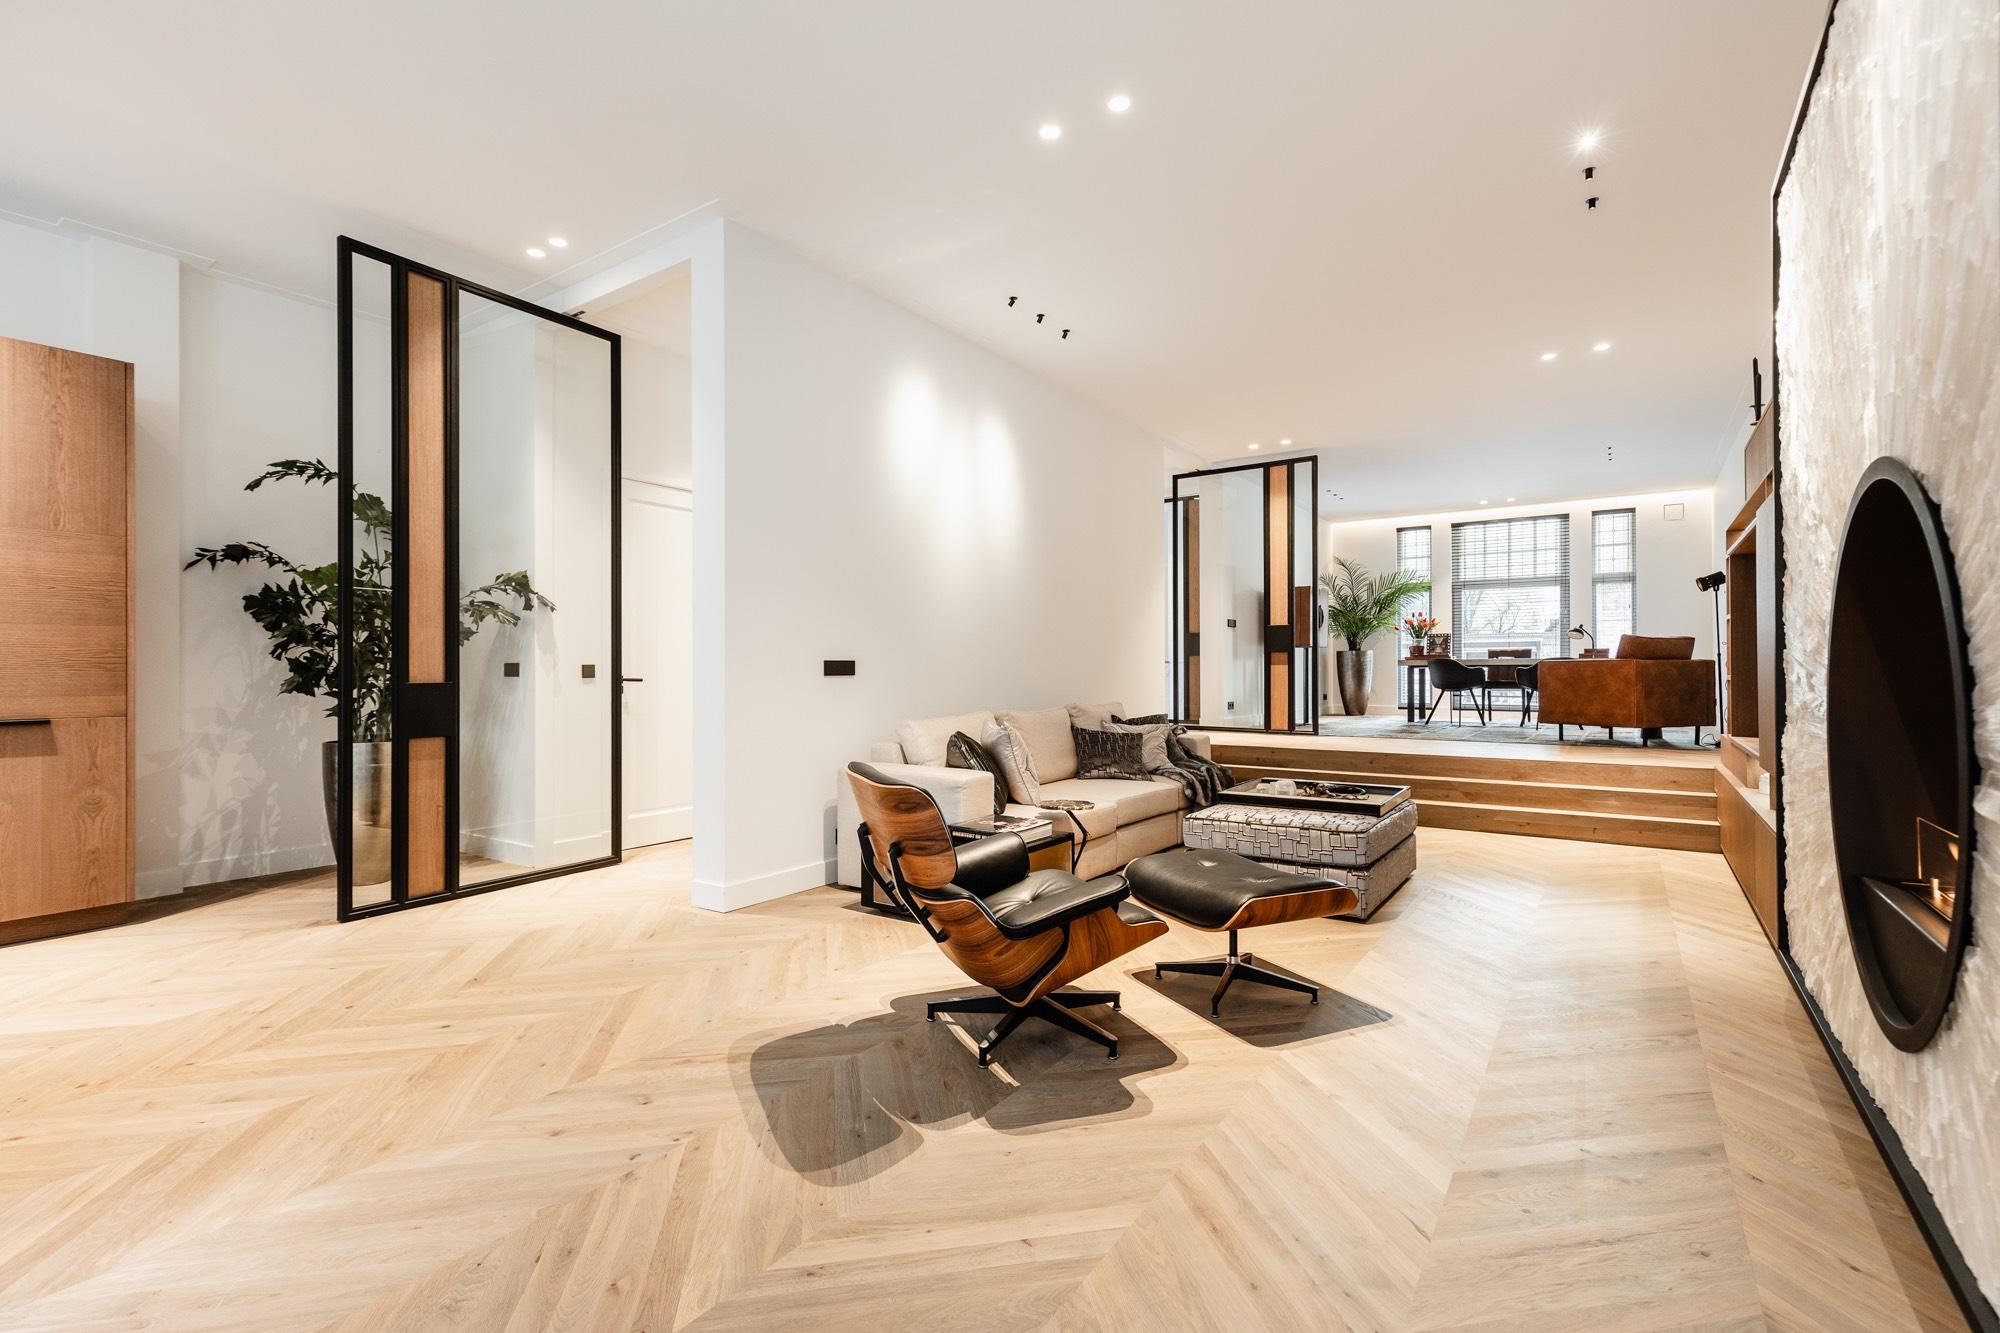 cravt-lairessestraat-renovation-3